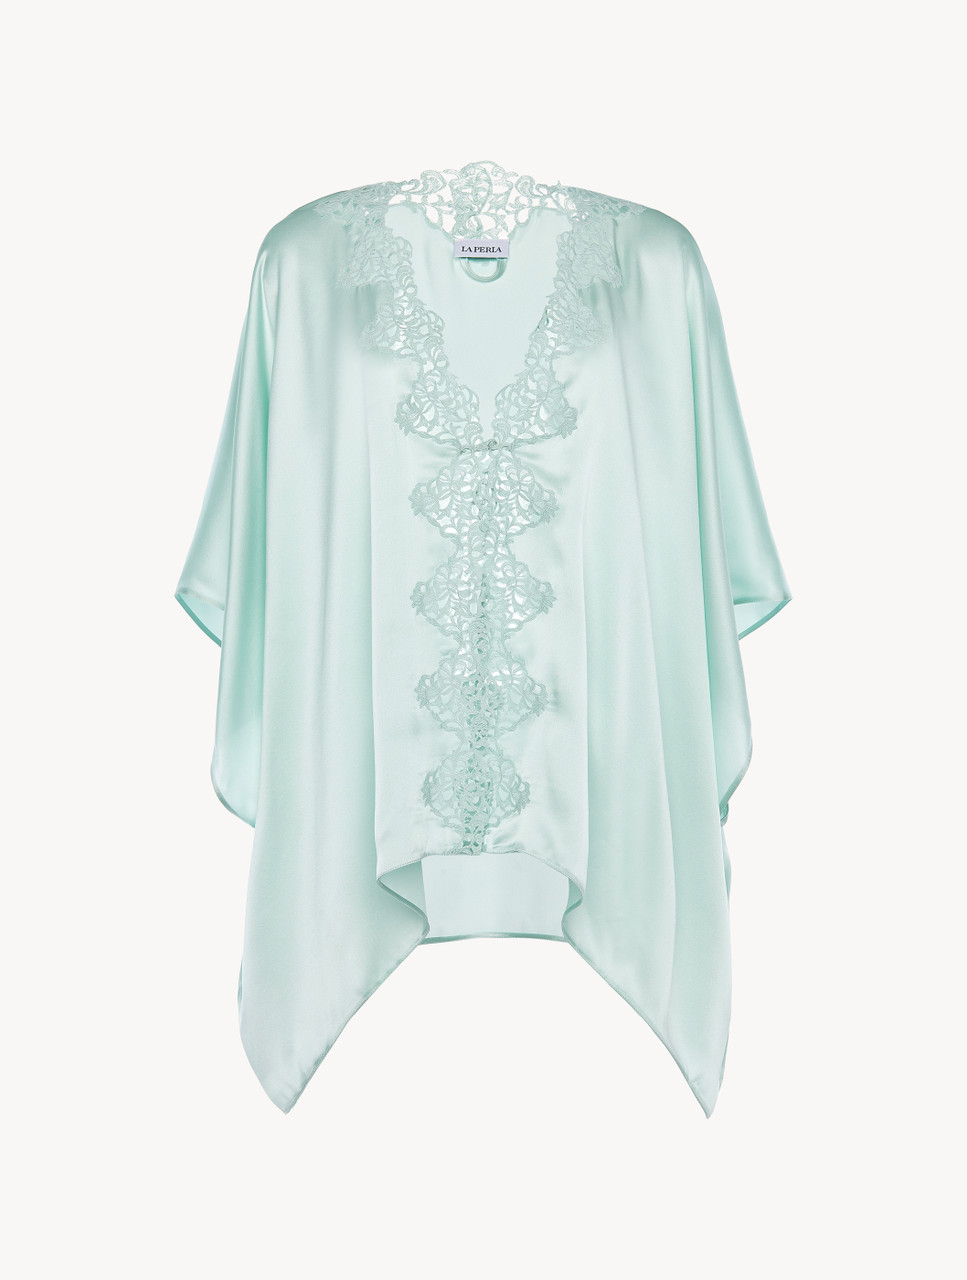 Mint Green Silk Robe With Macrame La Perla Asia